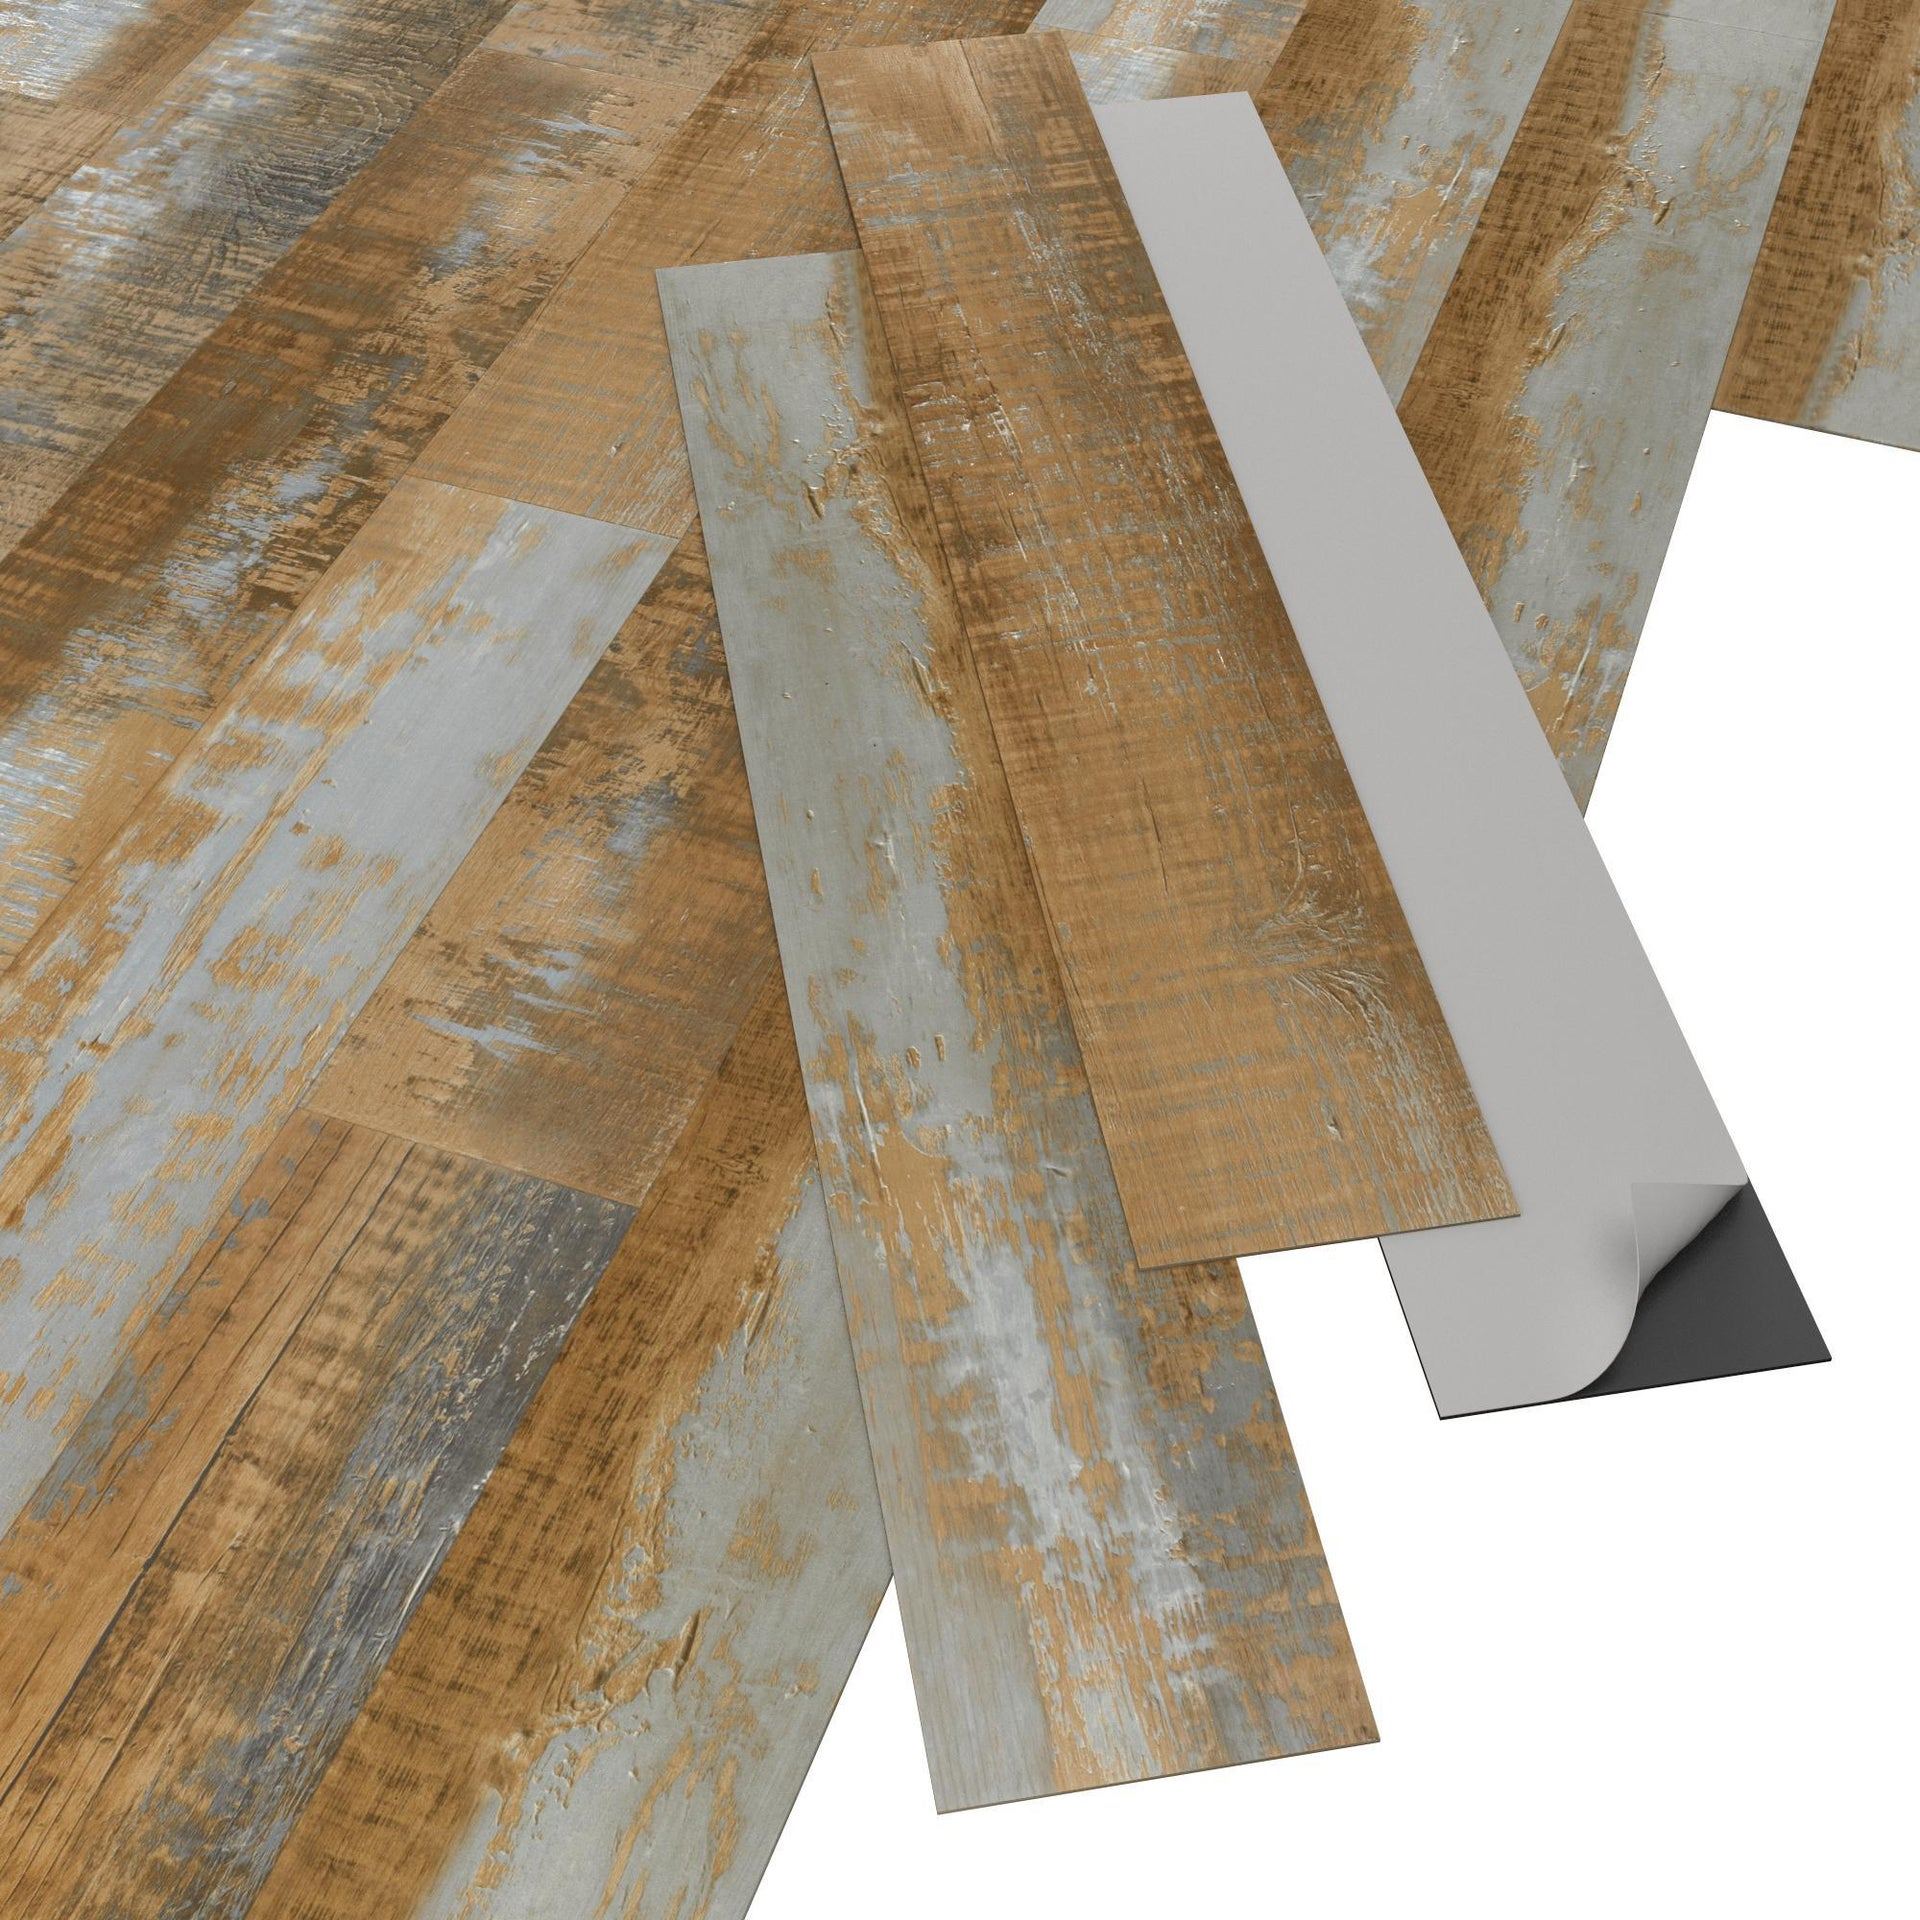 Pavimento PVC adesivo Mungo Sp 2 mm giallo / dorato - 6